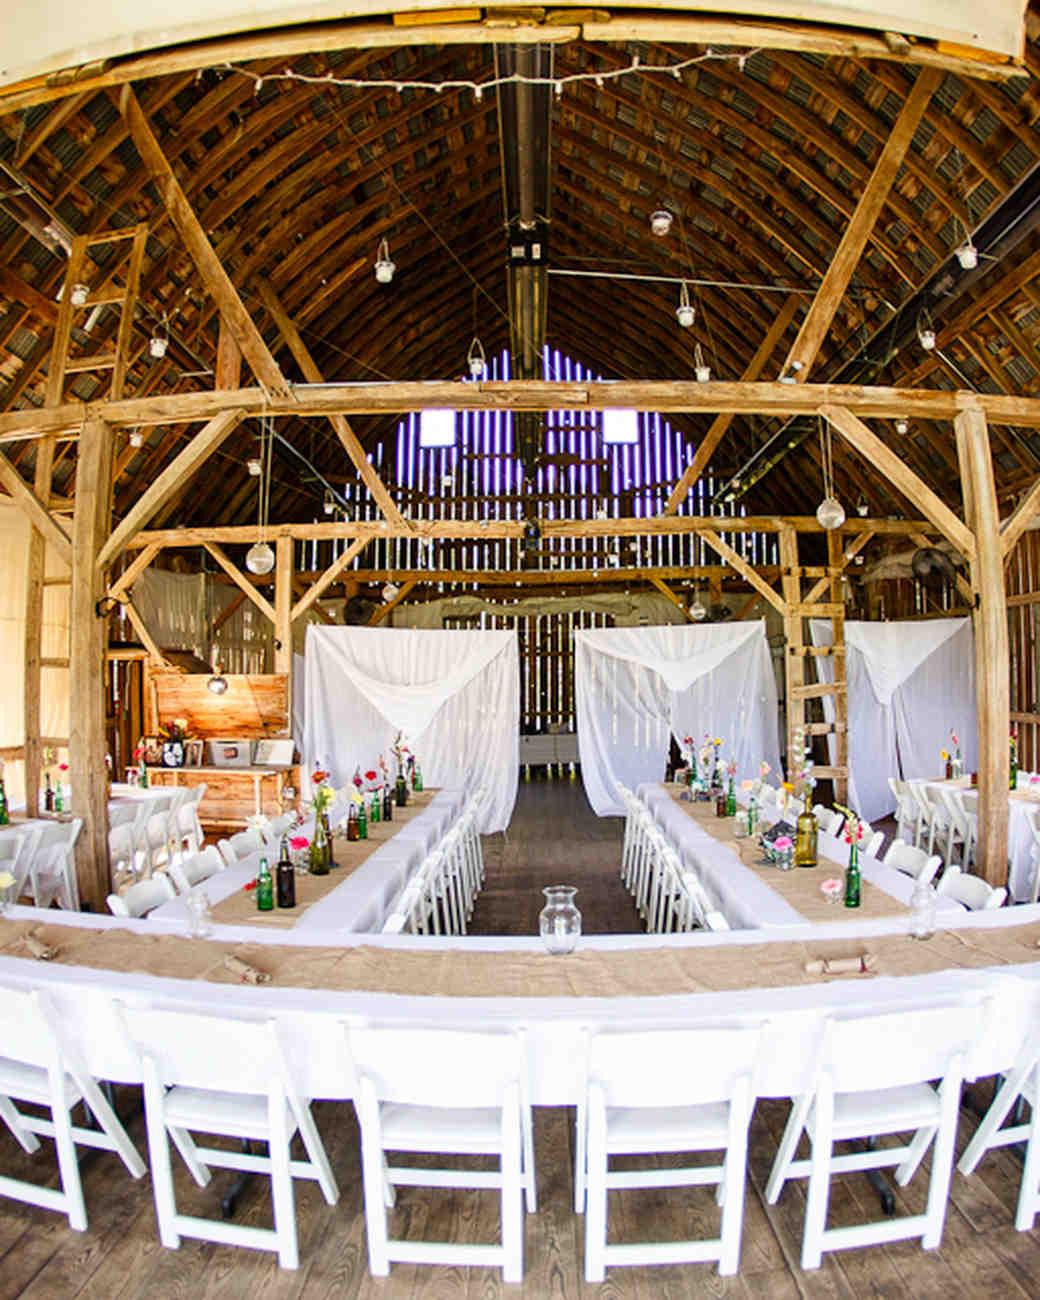 11 Rustic Wedding Venues To Book For Your Big Day Martha Stewart Weddings